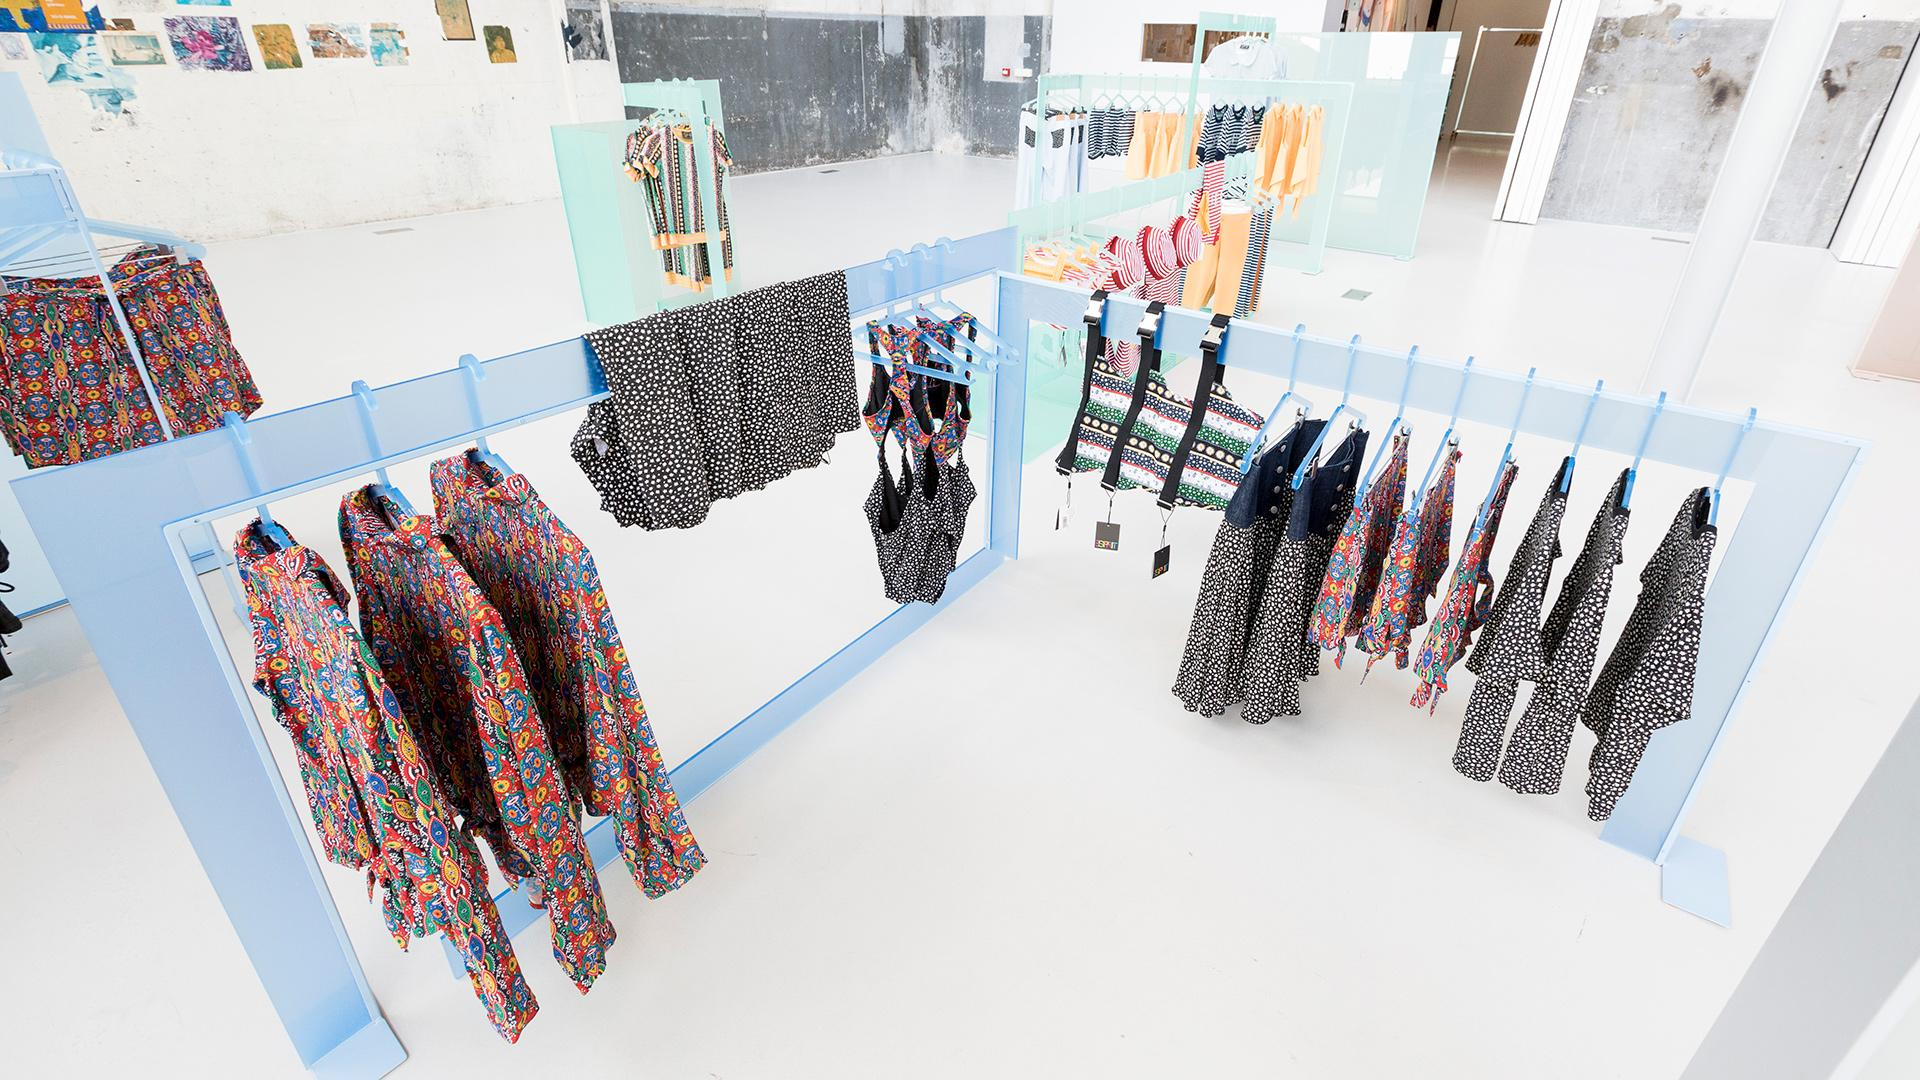 Frame Noman Studio Explodes The Design Box For Esprit X Opening Ceremony